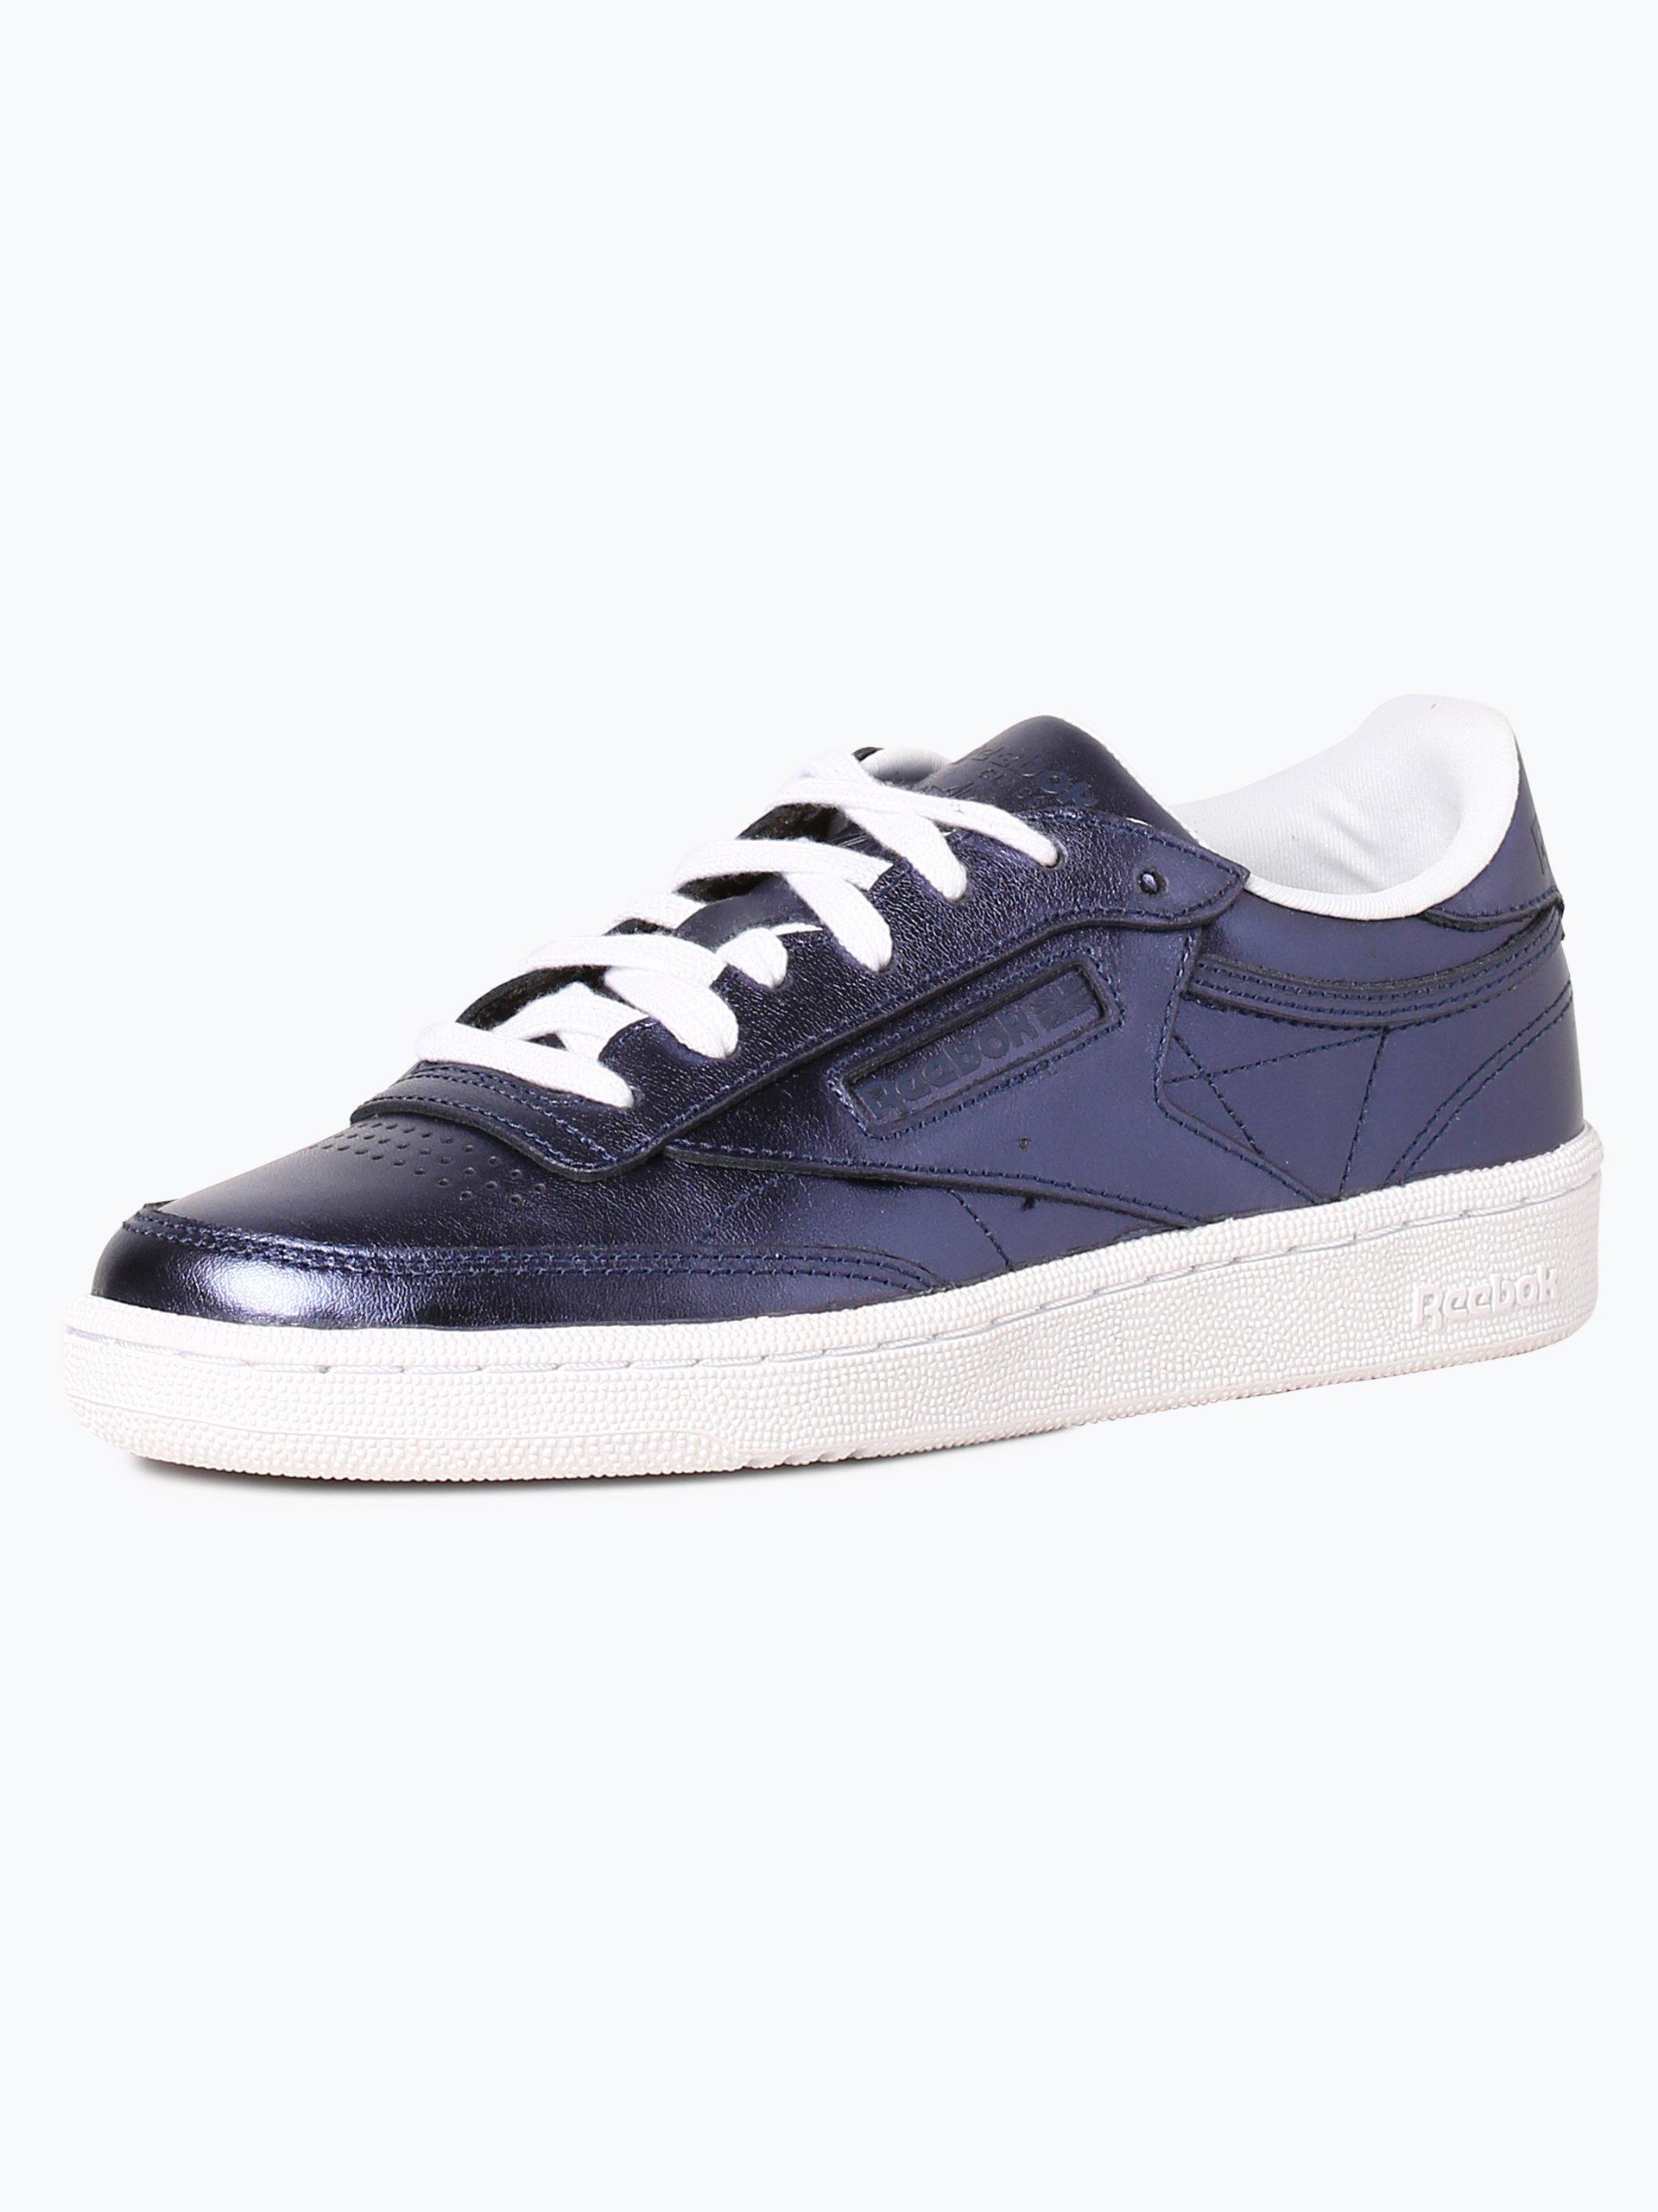 reebok damen sneaker aus leder blau uni online kaufen. Black Bedroom Furniture Sets. Home Design Ideas